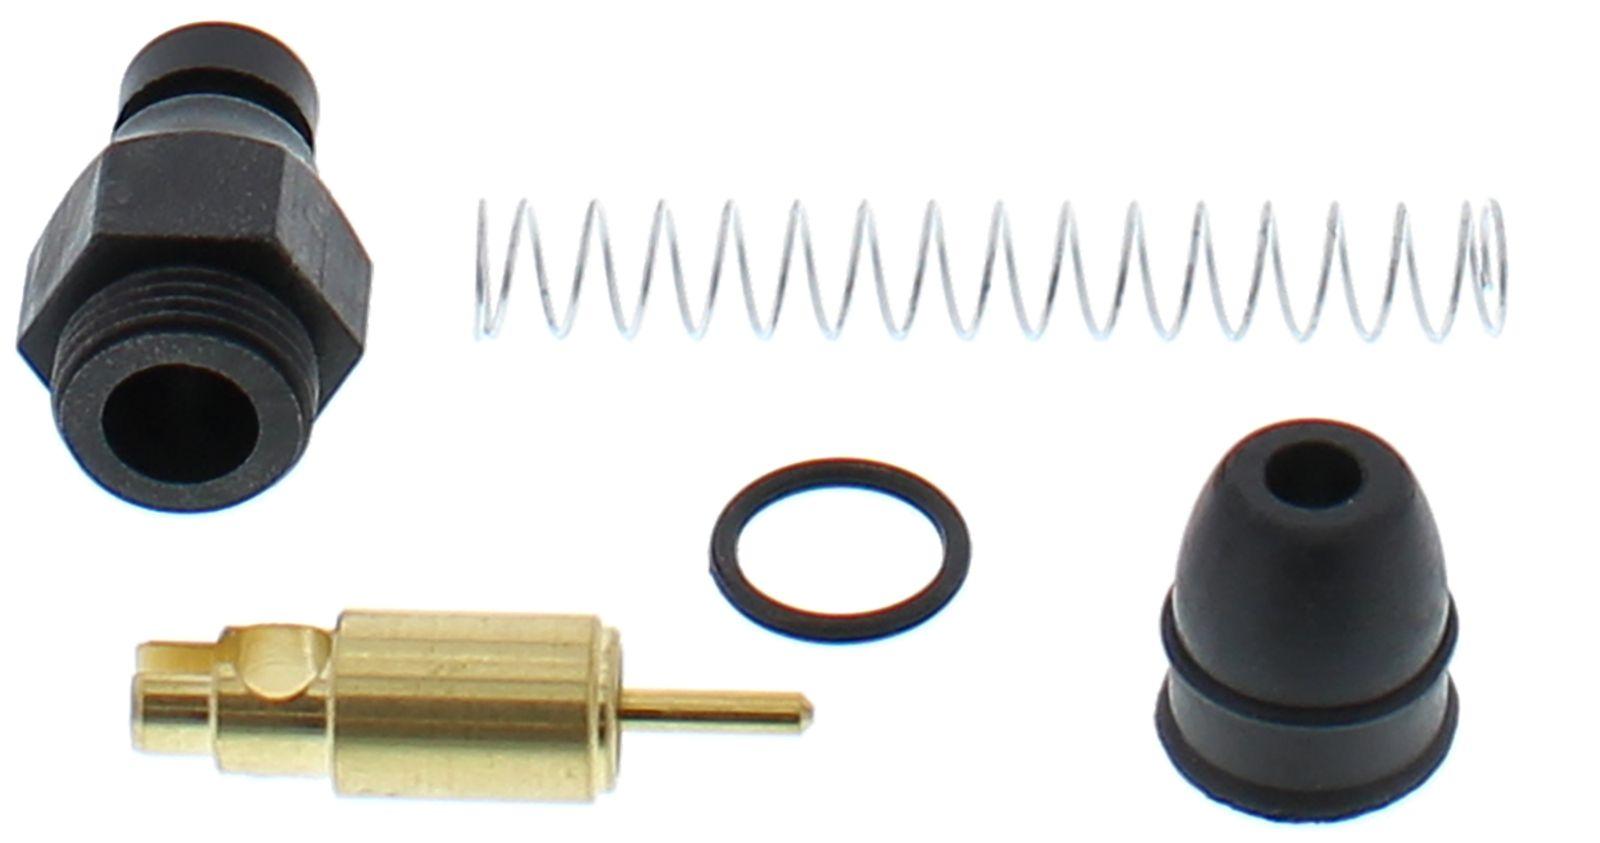 Wrp Choke Plunger Kits - WRP461027 image